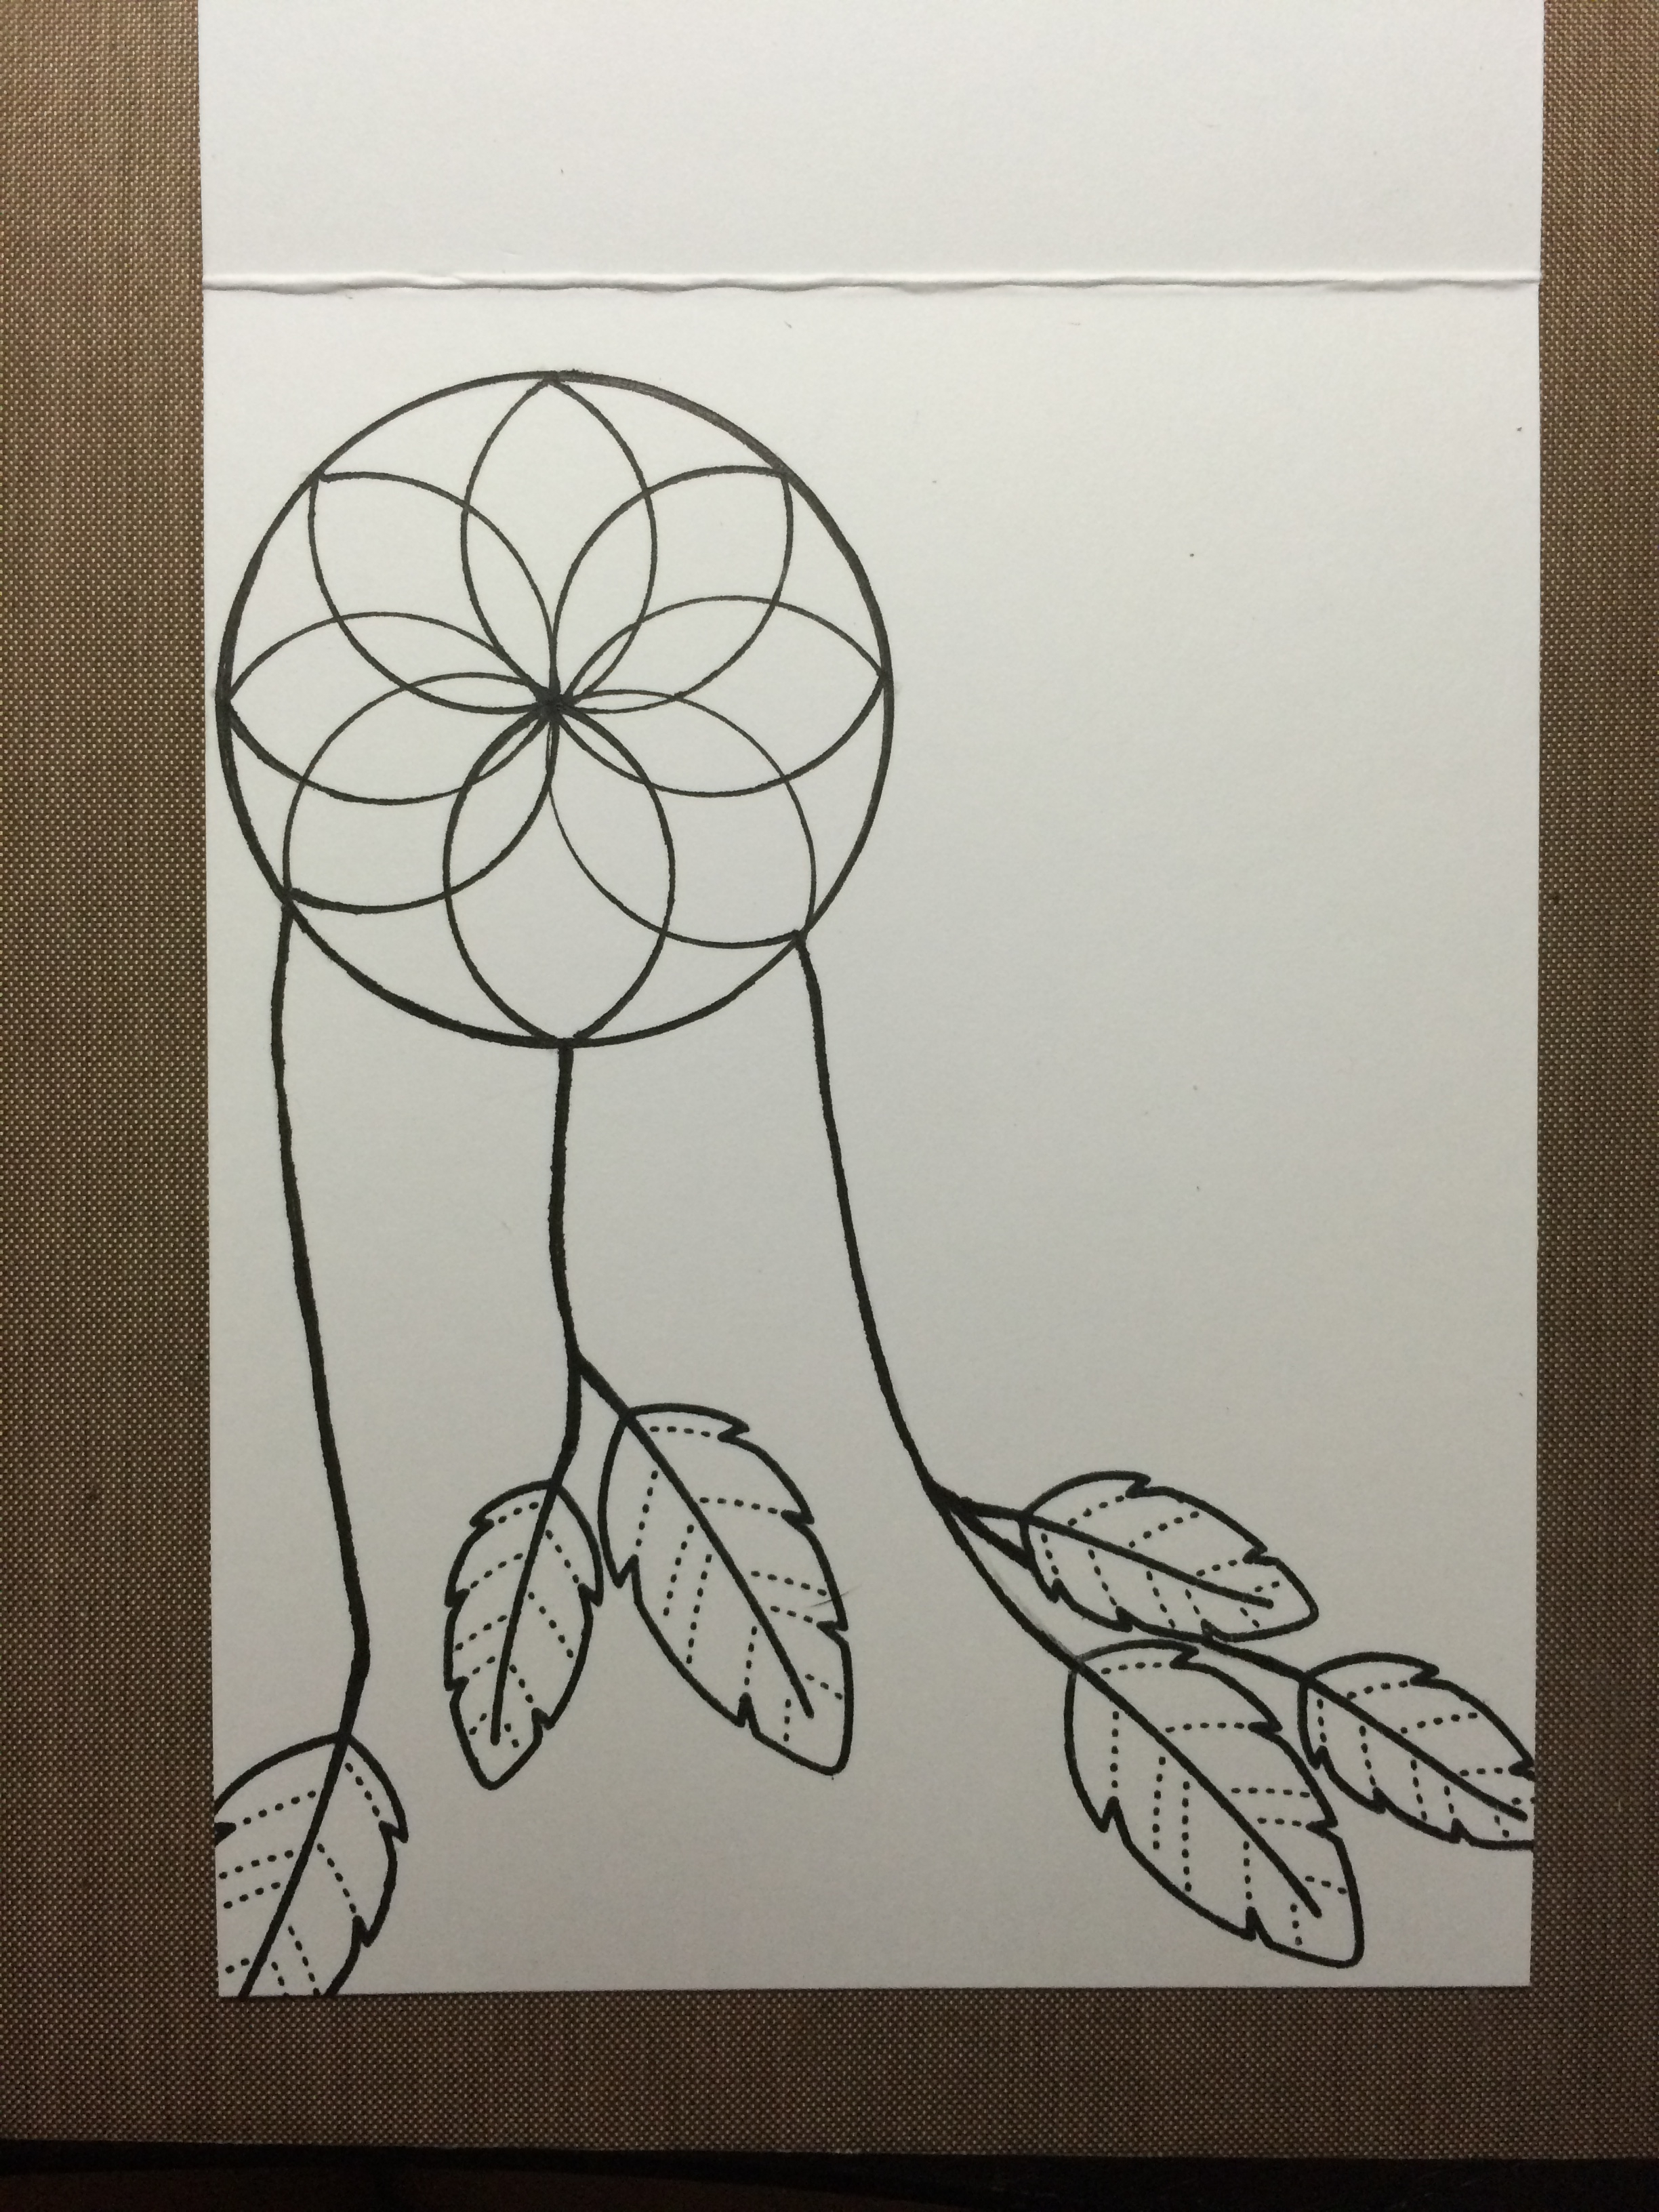 2448x3264 Dream Catcher Drawing Pencil Easy Simple Dreamcatcher Designs